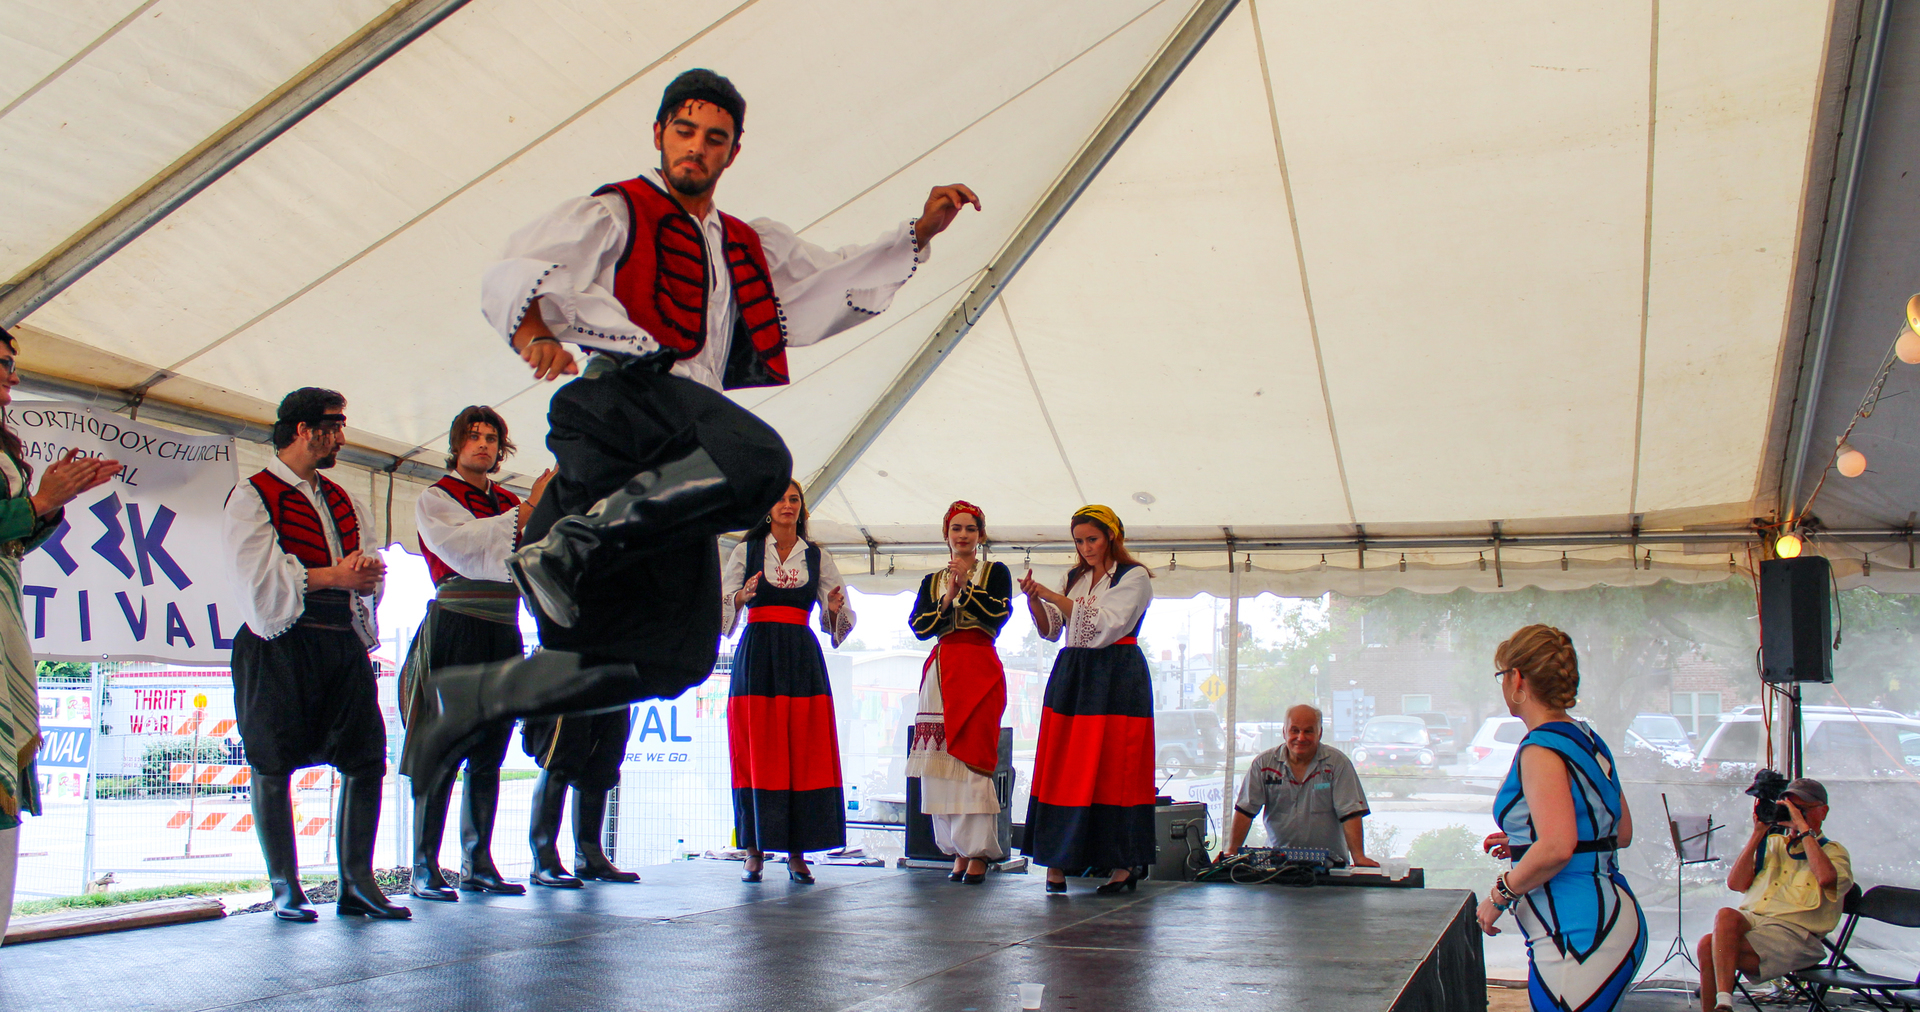 Omaha's Original Greek Festival